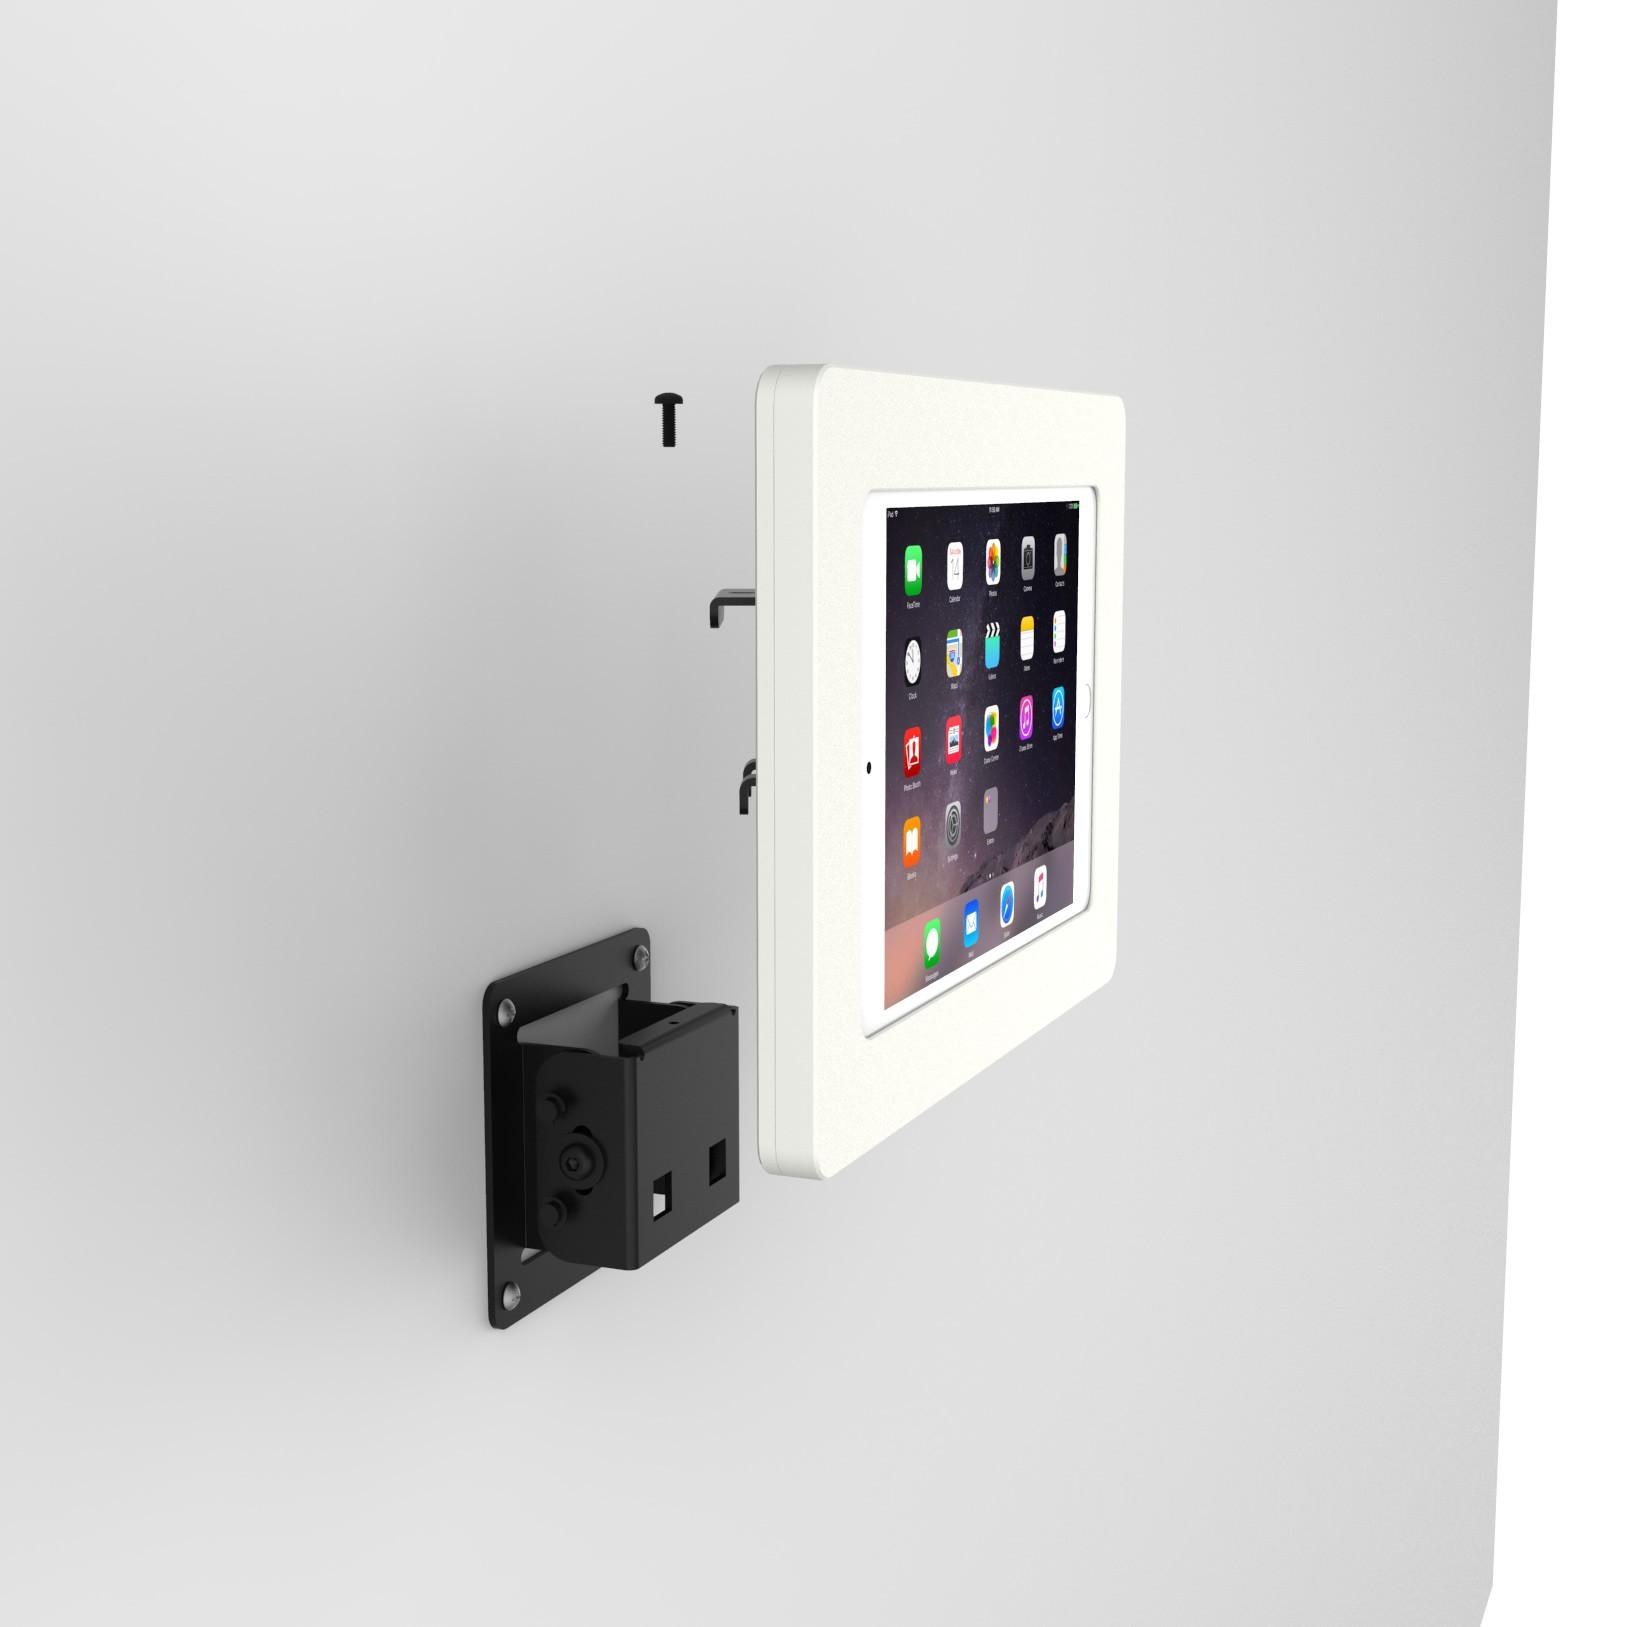 Tilting Wall Ipad Tablet Surface Mount Vidabox Kiosks